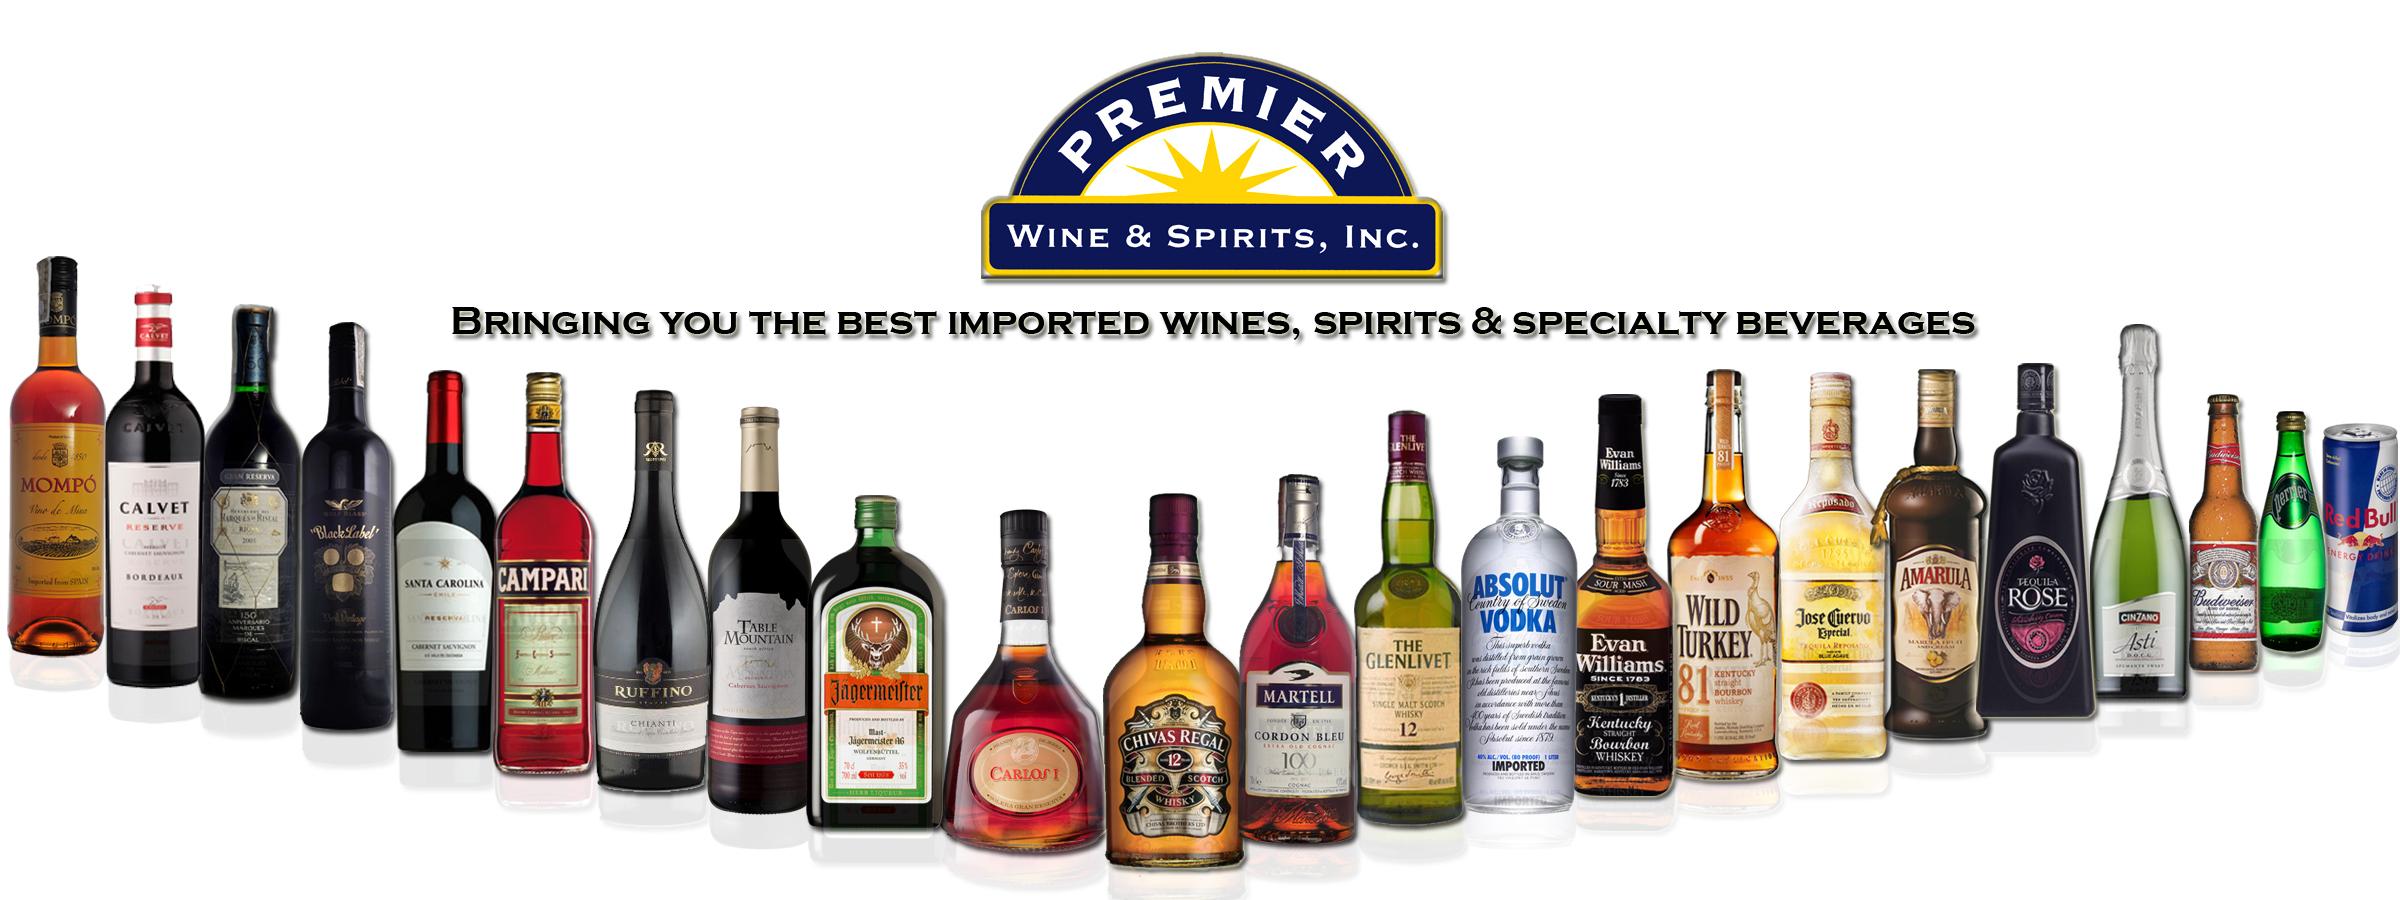 Premier Wine & Spirits Inc.